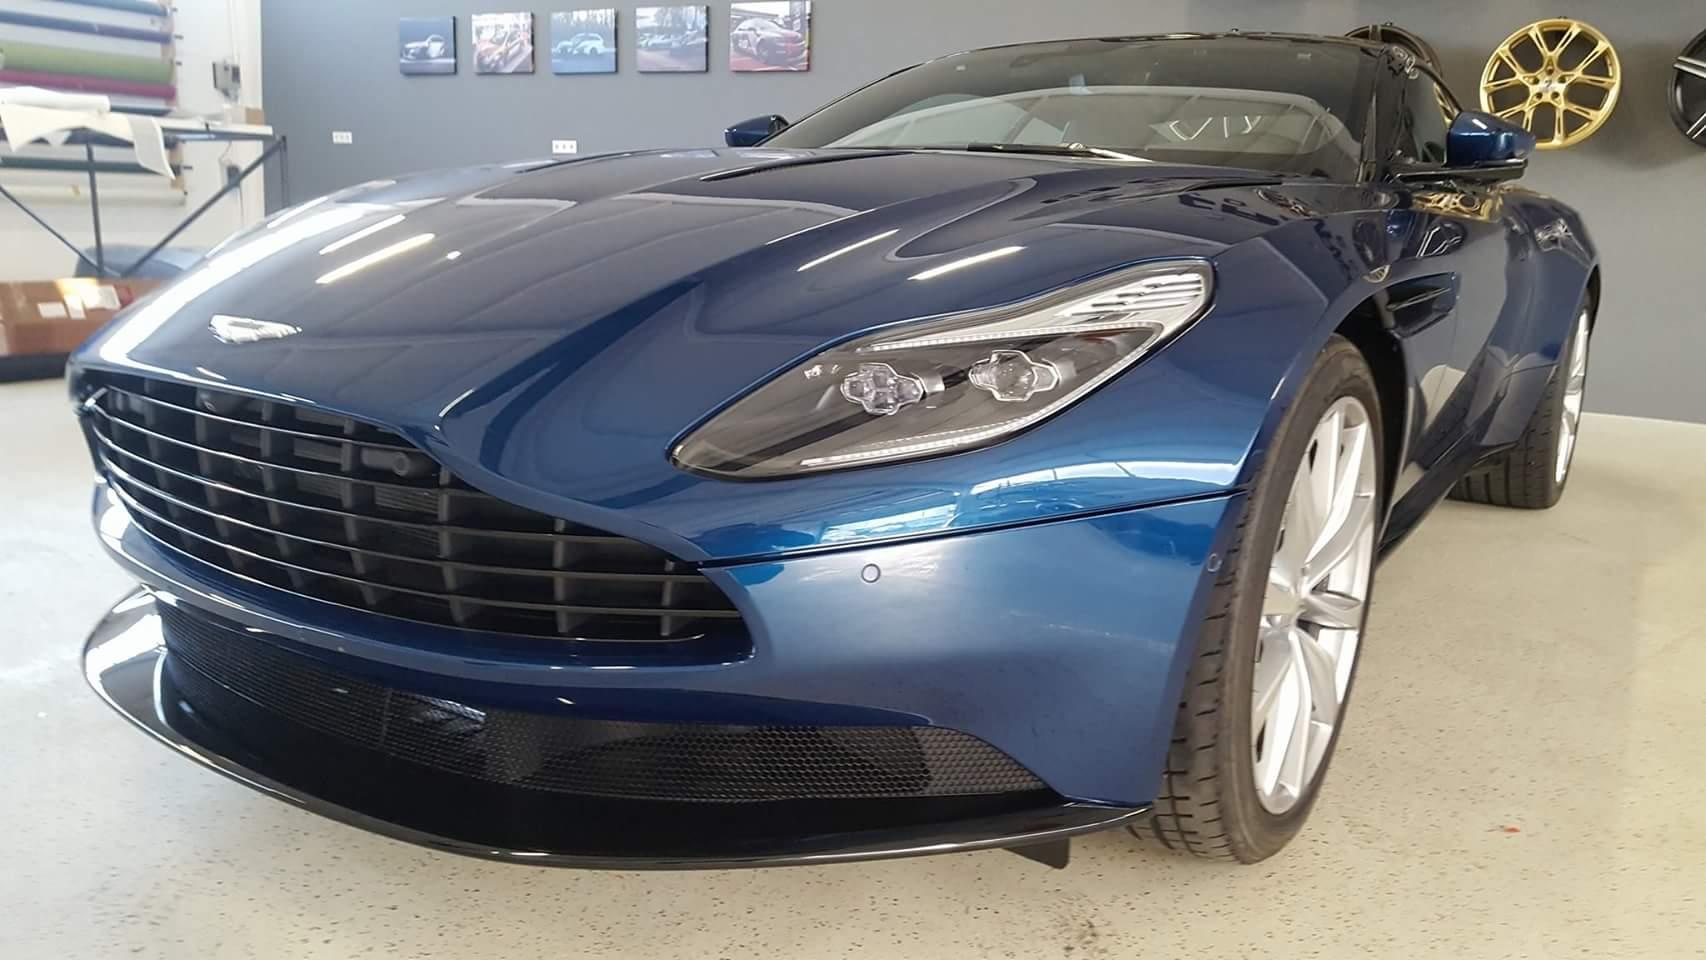 Aston Martin XPEL Lackschutzfolie